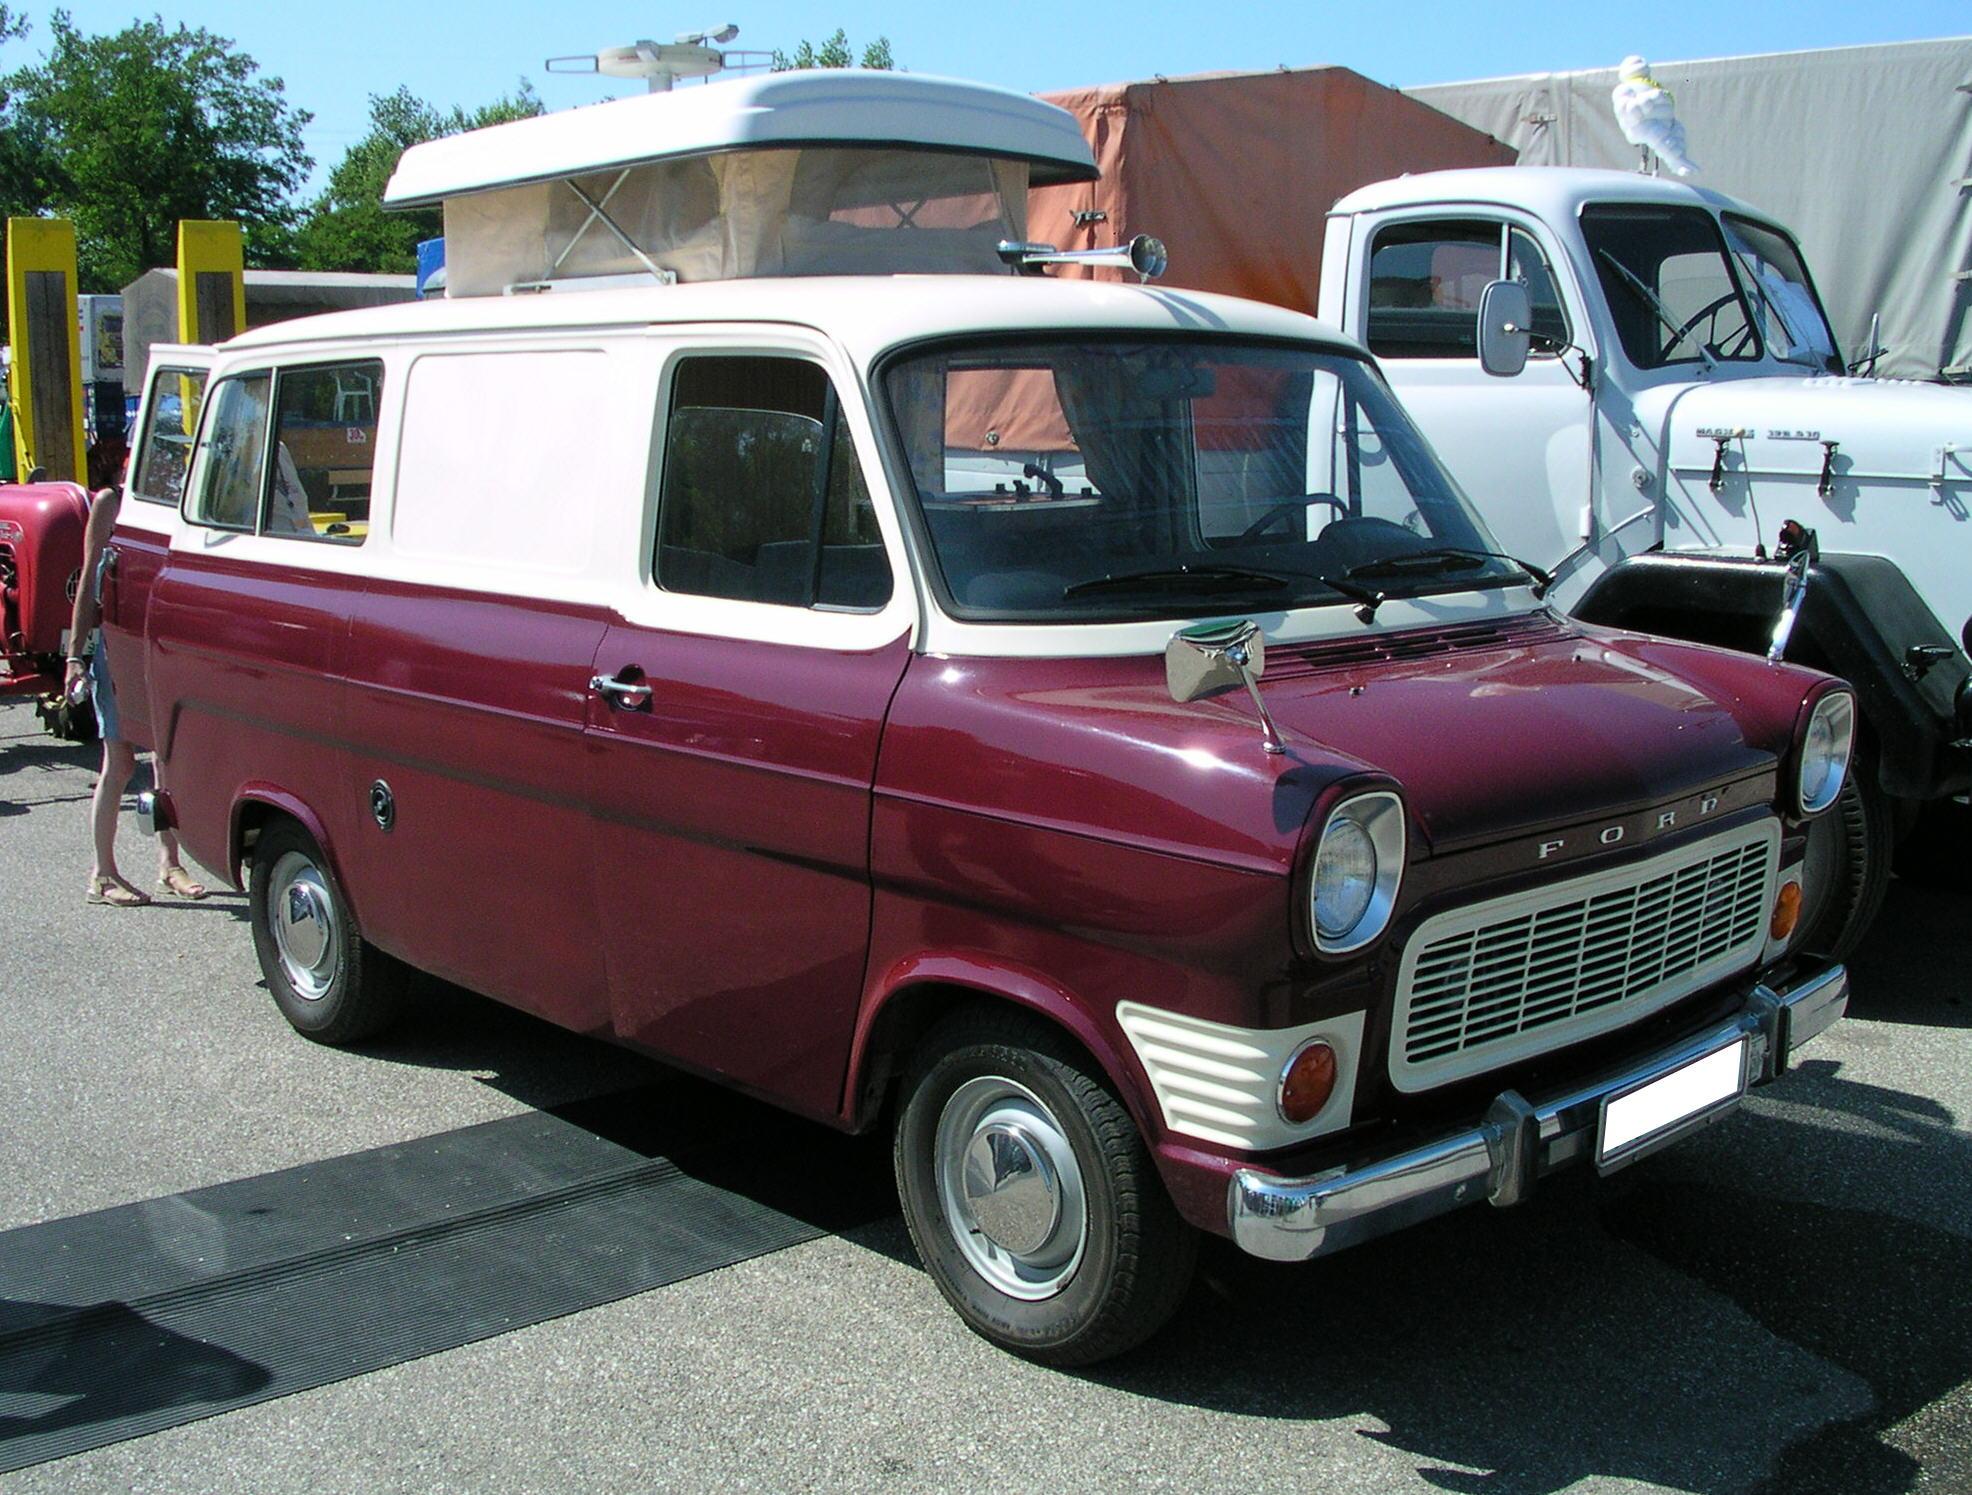 Ford Transit I Wohnmobil vr.jpg